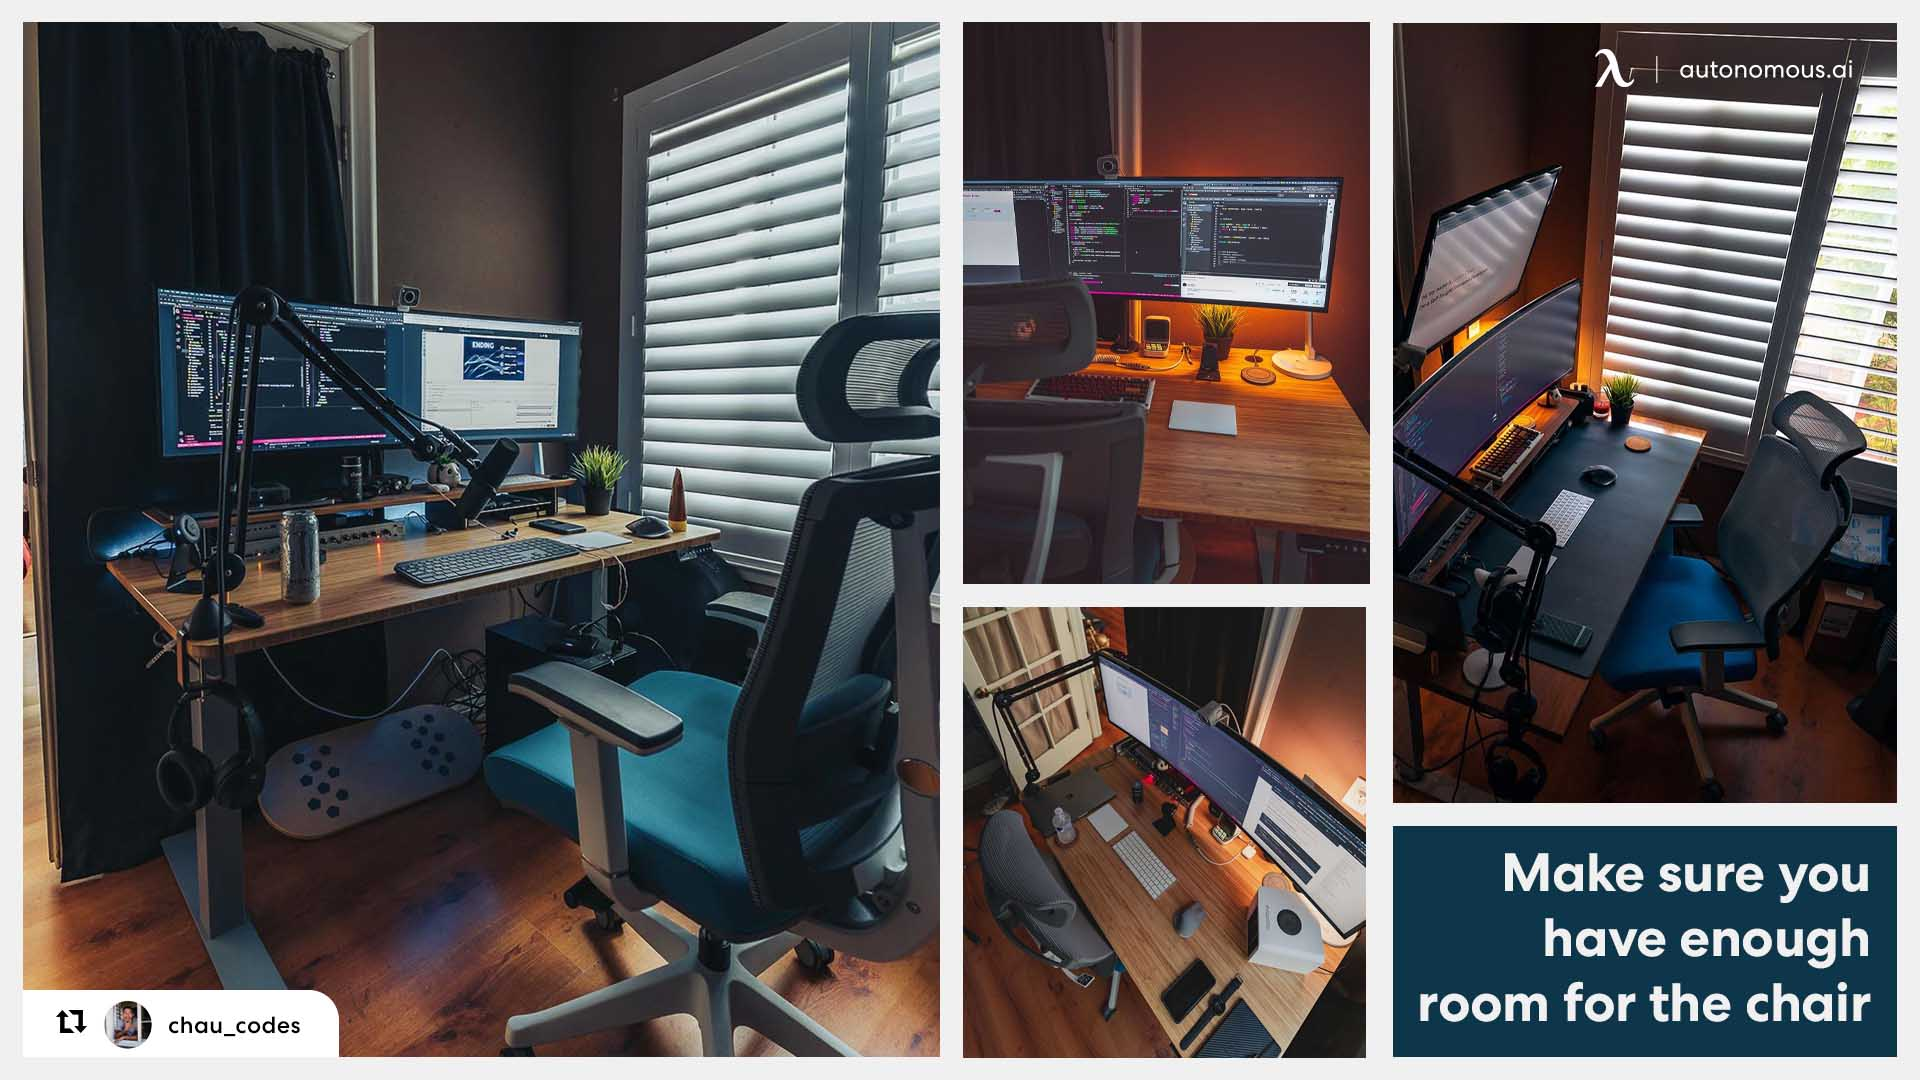 Smart Desk with ergonomic chair